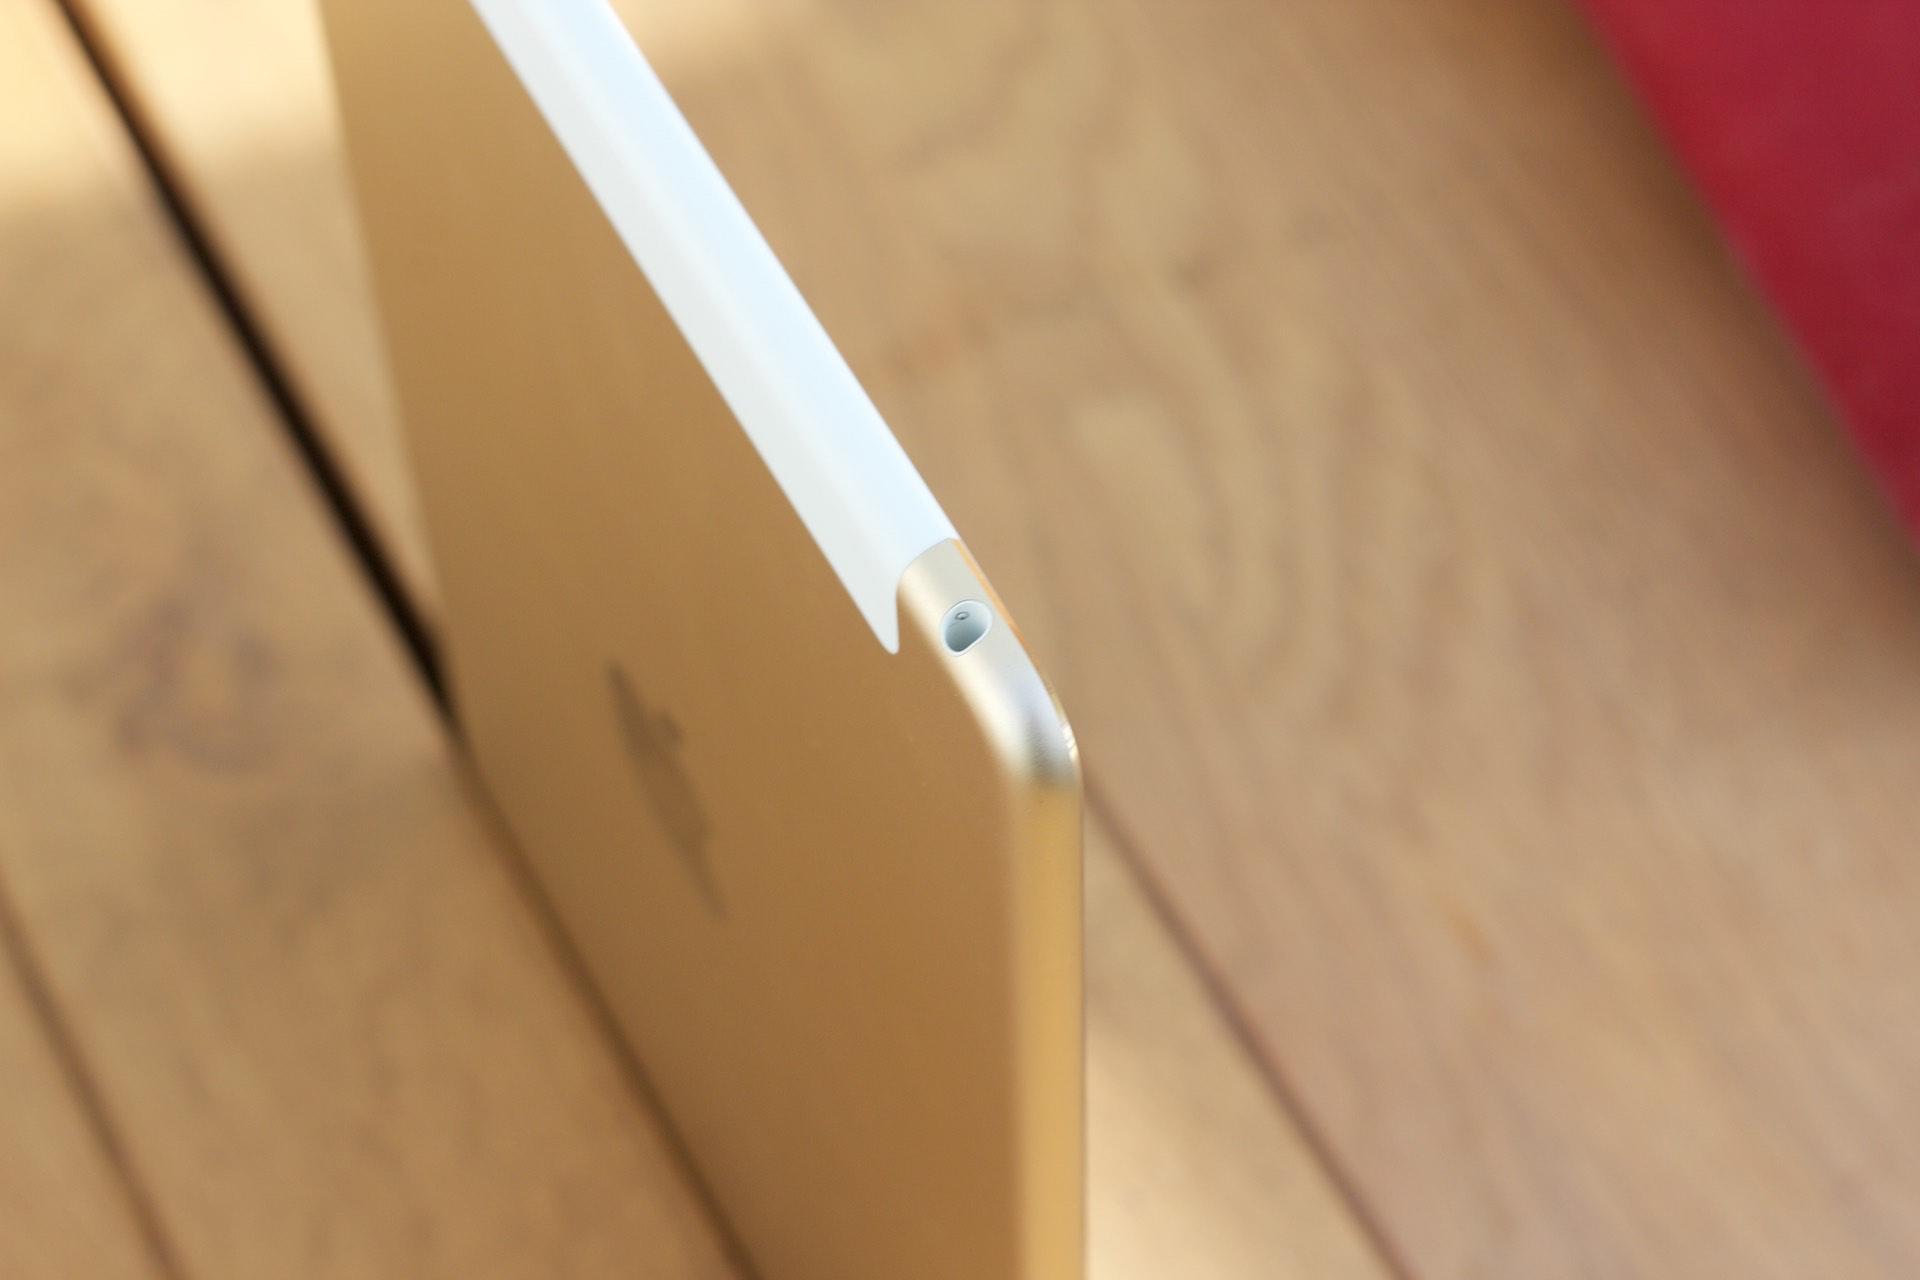 apple-ipad-air-2-review 10.jpg